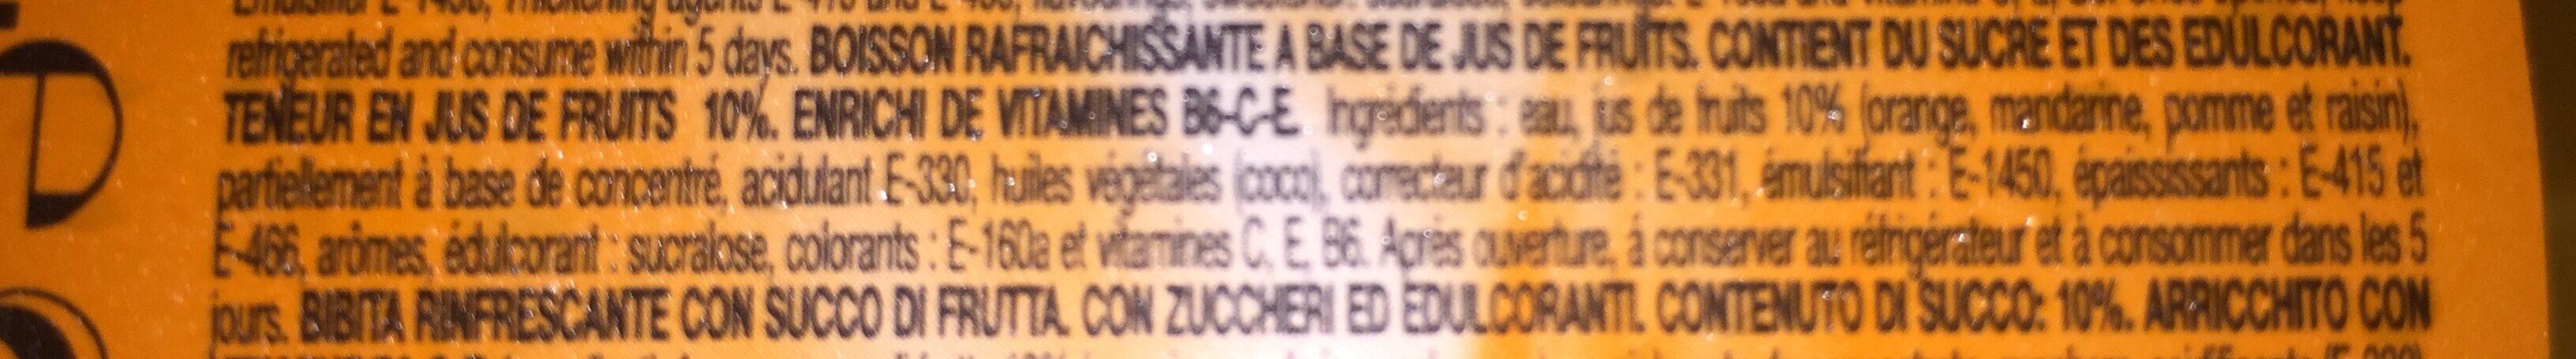 Bebida de zumo de naranja sin gas sin gluten - Ingredients